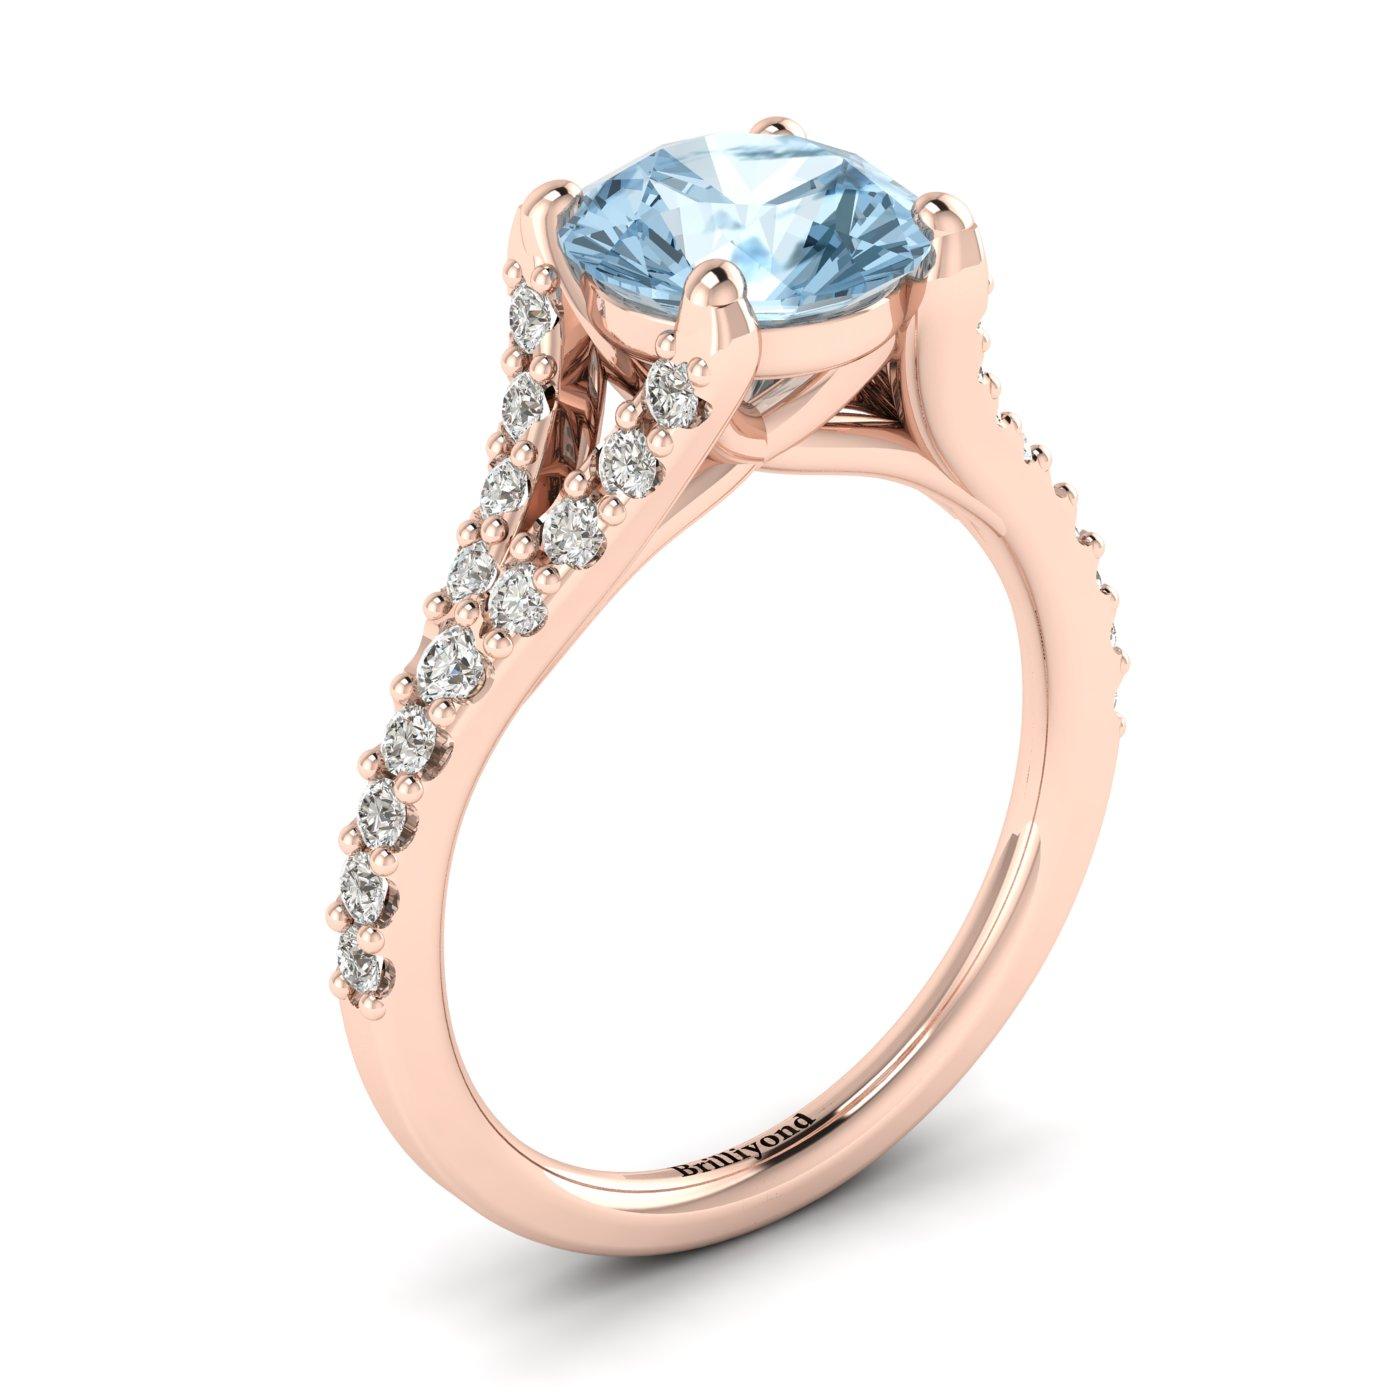 A unique rose gold engagement ring with pavé split shank set white cubic zirconia accent stones.